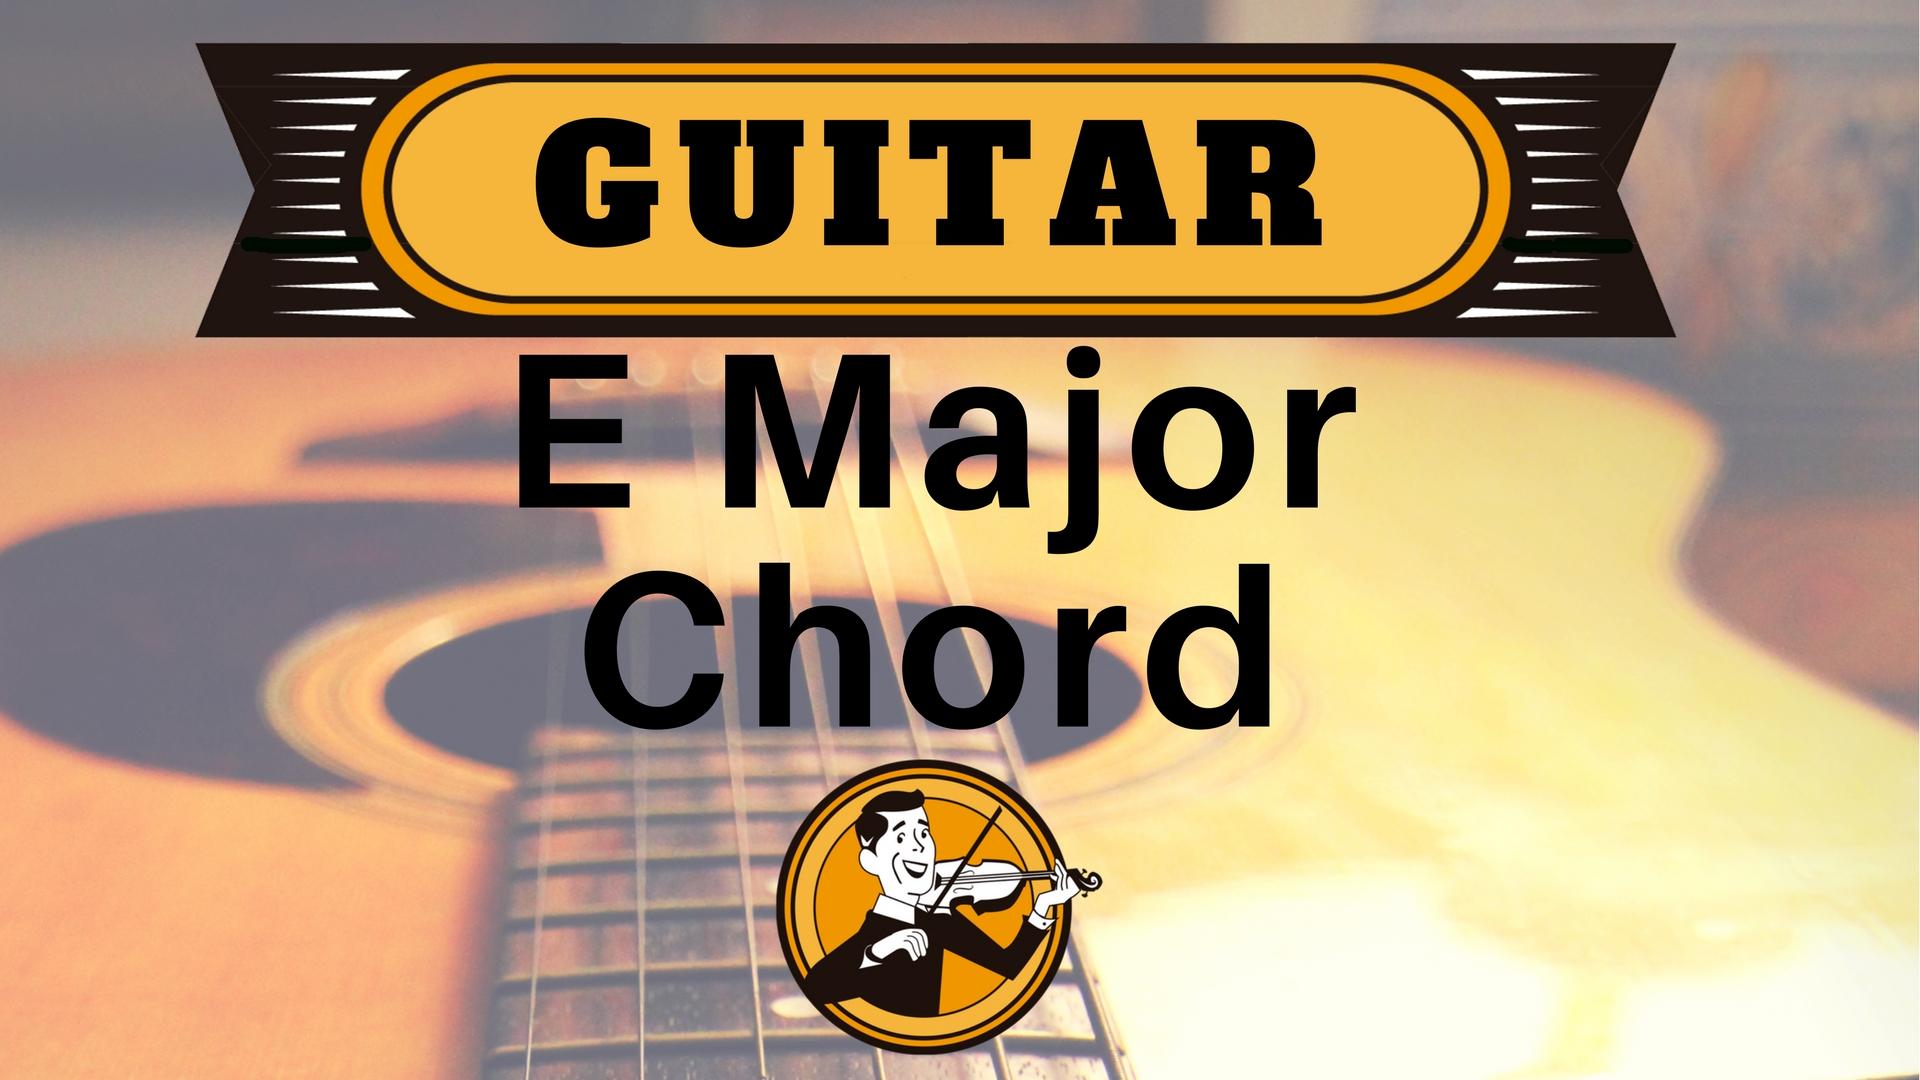 Guitar E Major Chord